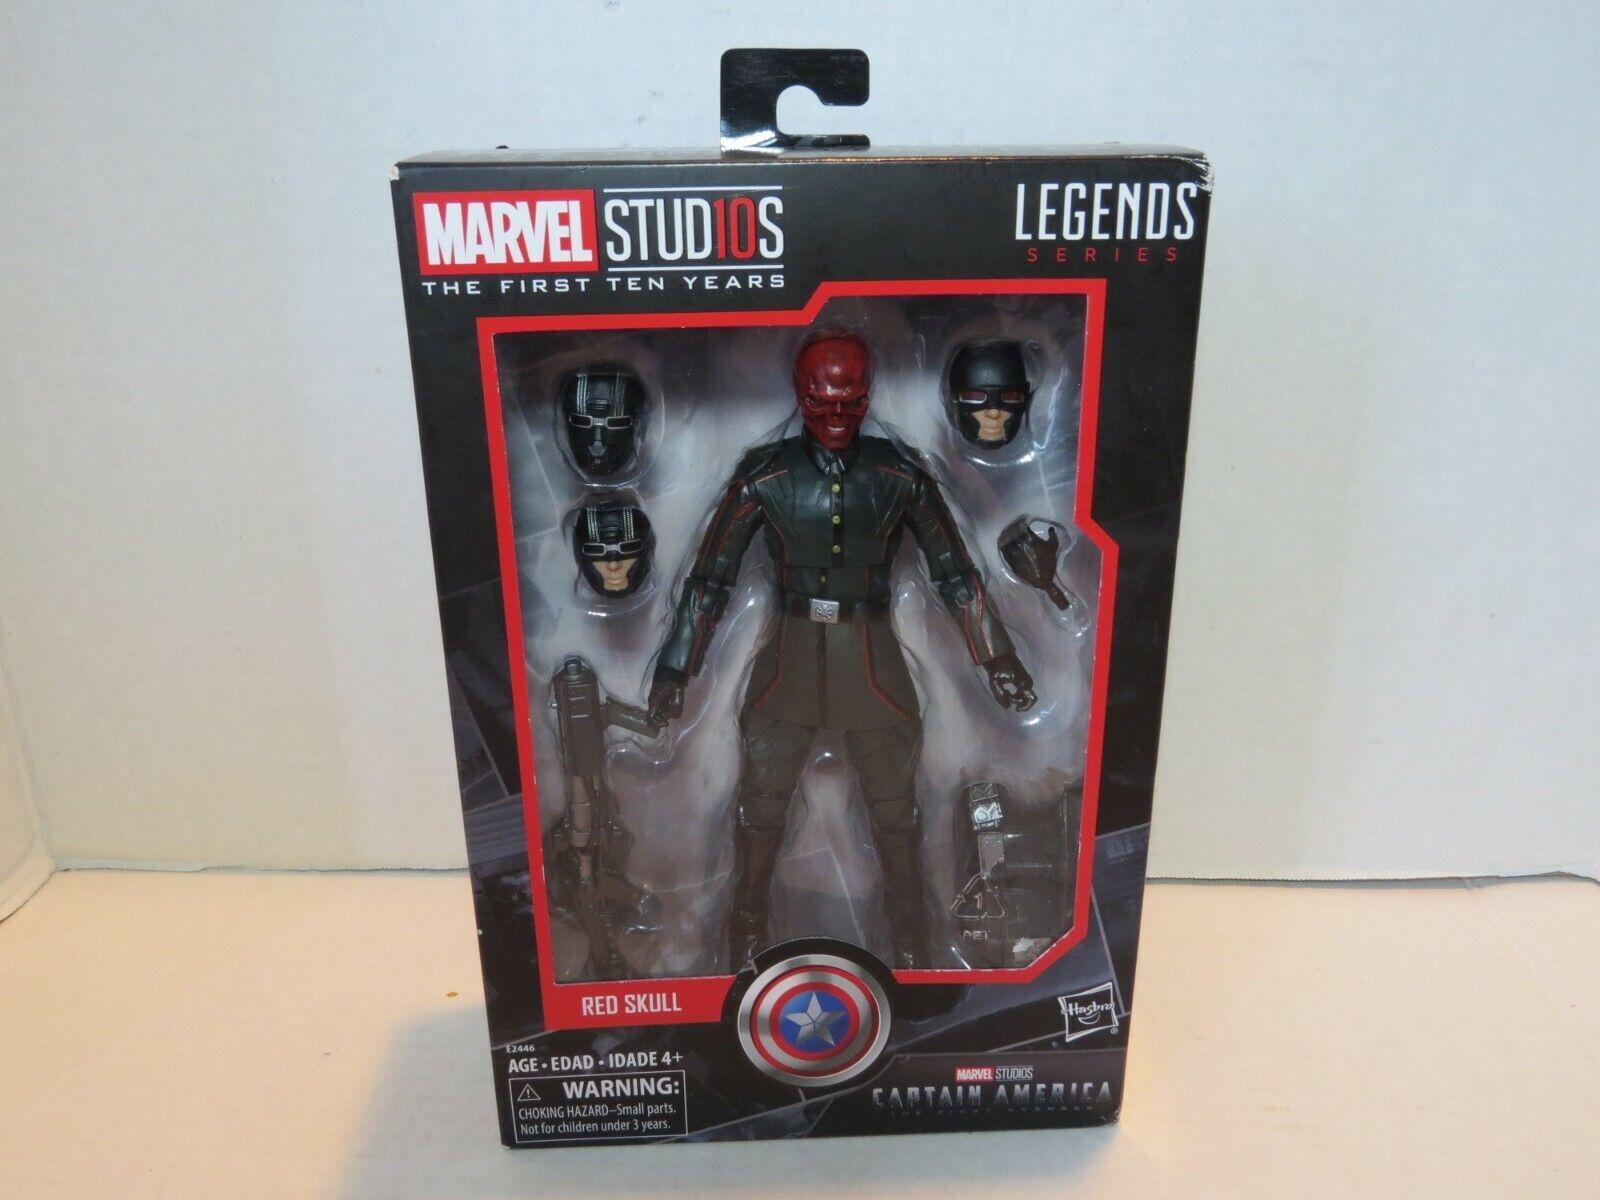 E2446 Hasbro Marvel Studios The First Ten Years Legends Series Red Skull